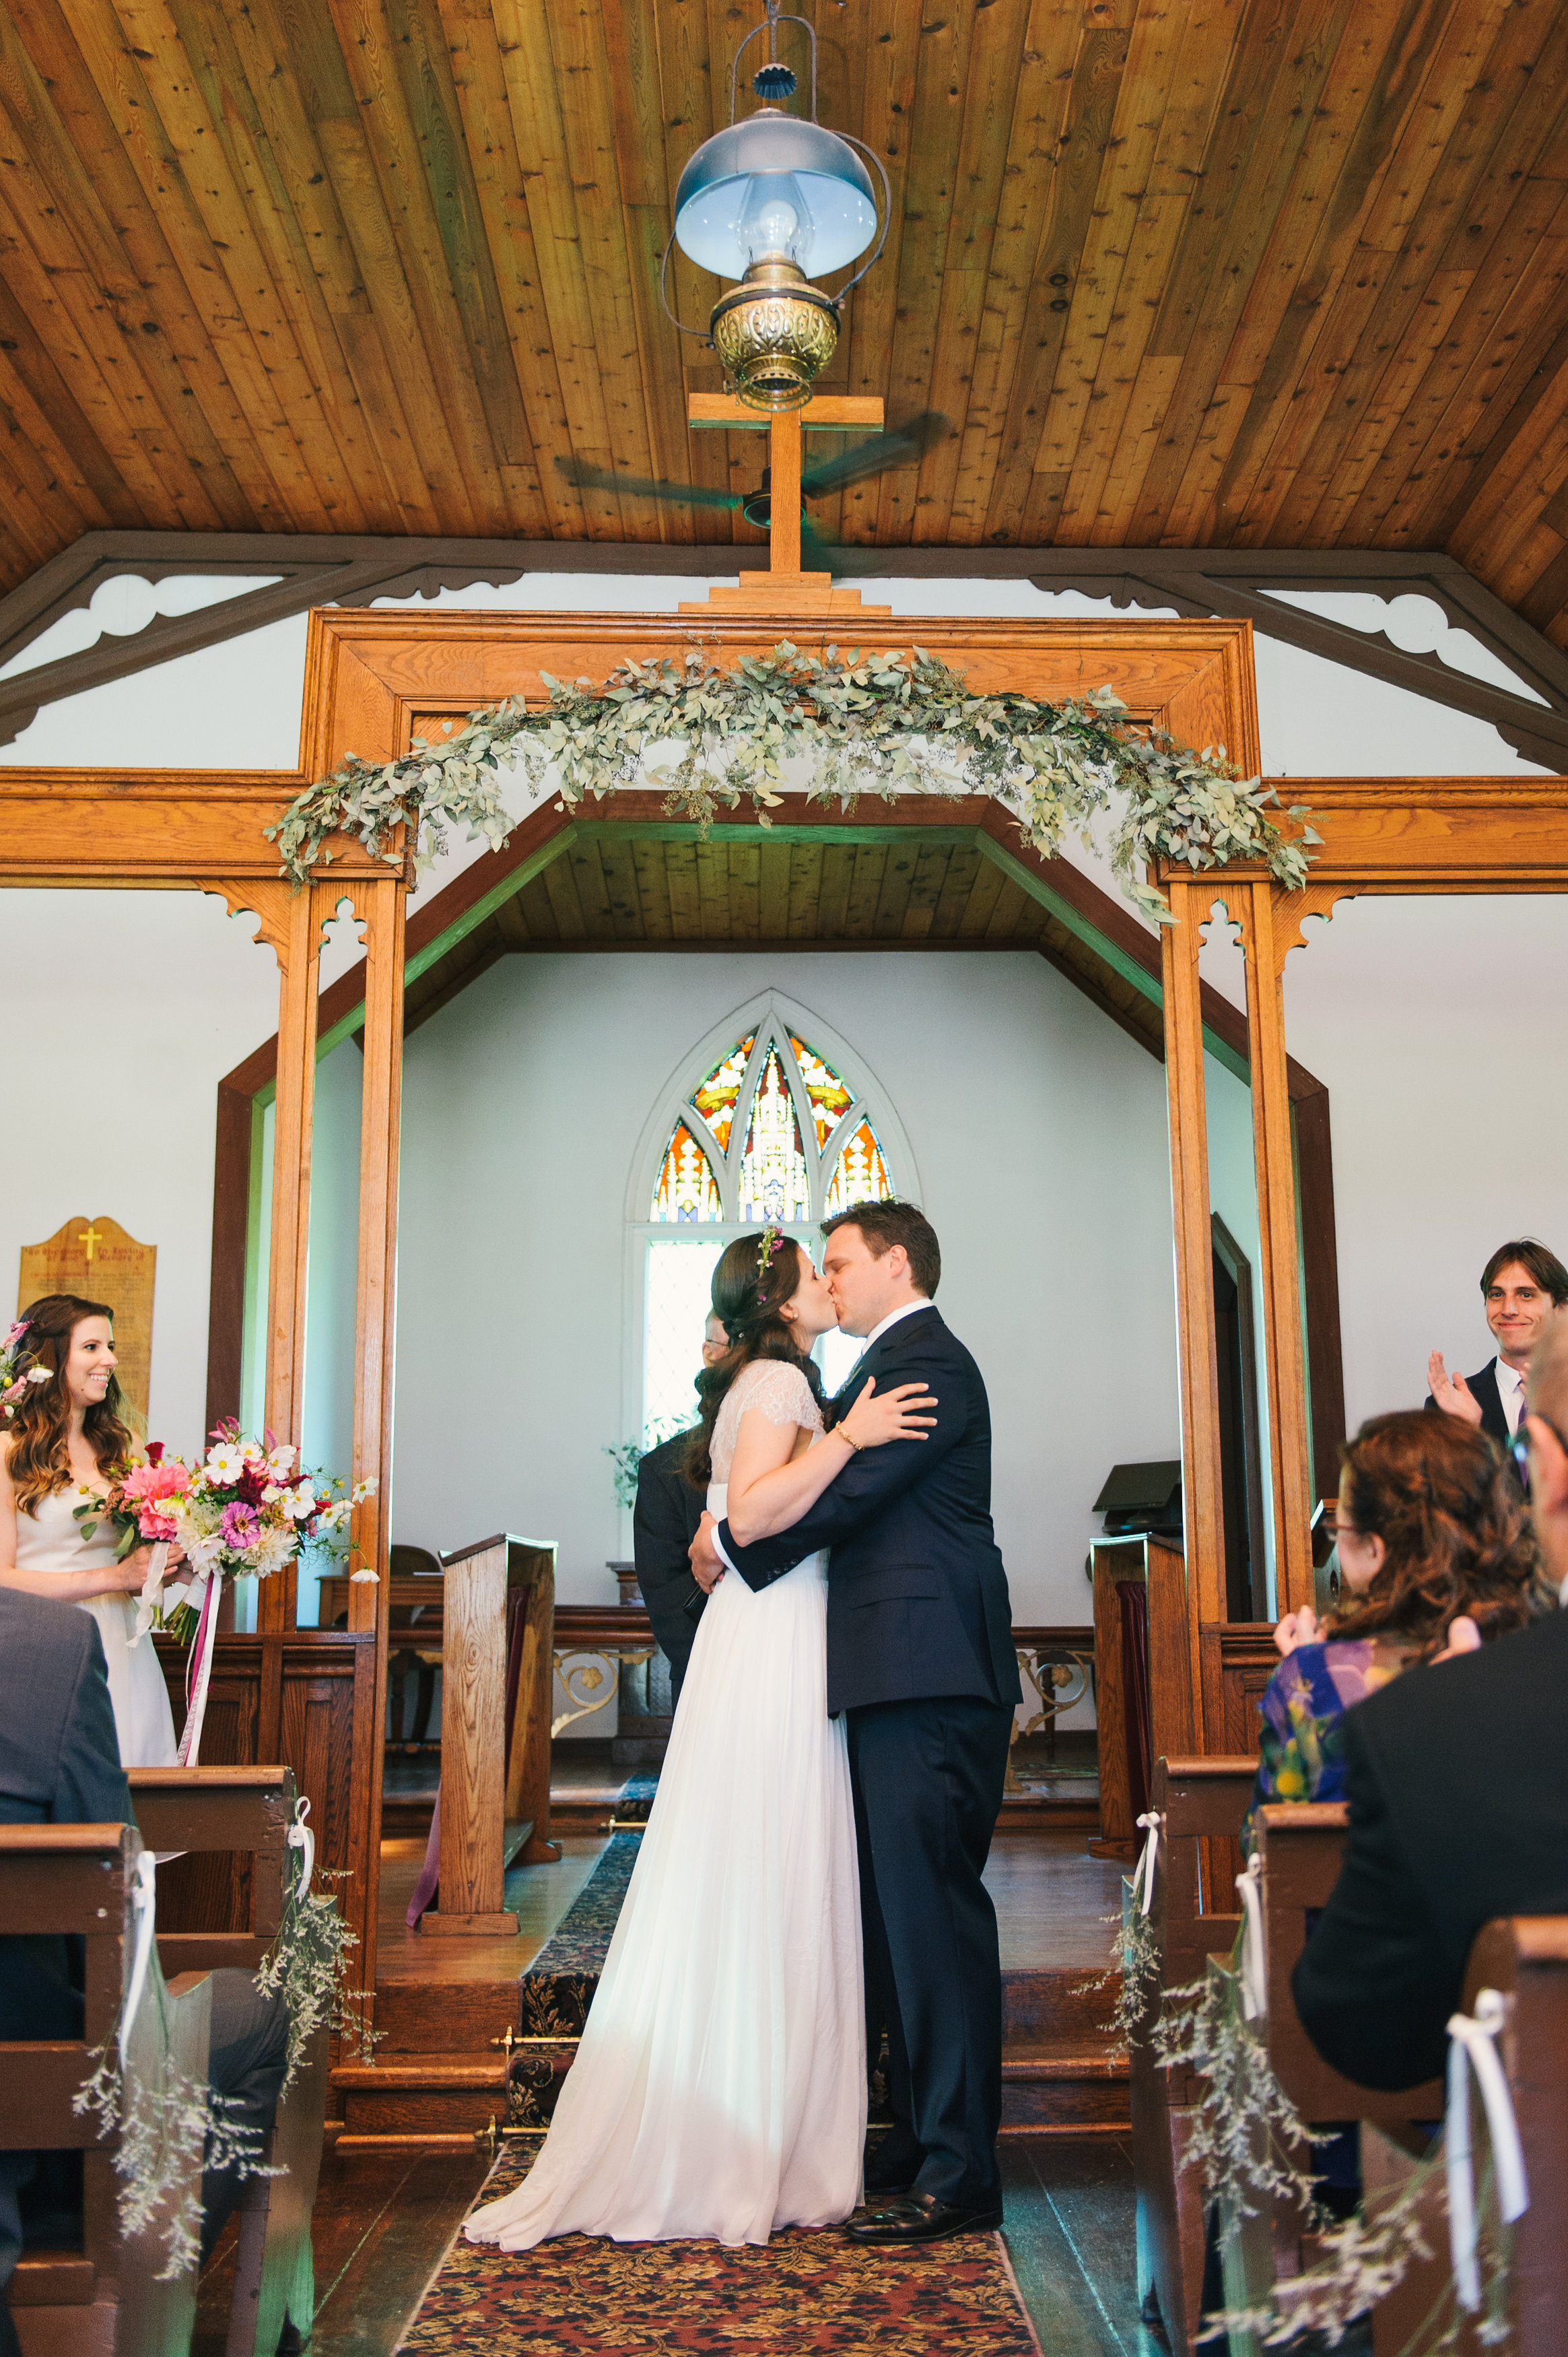 marial-daniel-wedding-balls-falls-sara-wilde-photography-0125.jpg